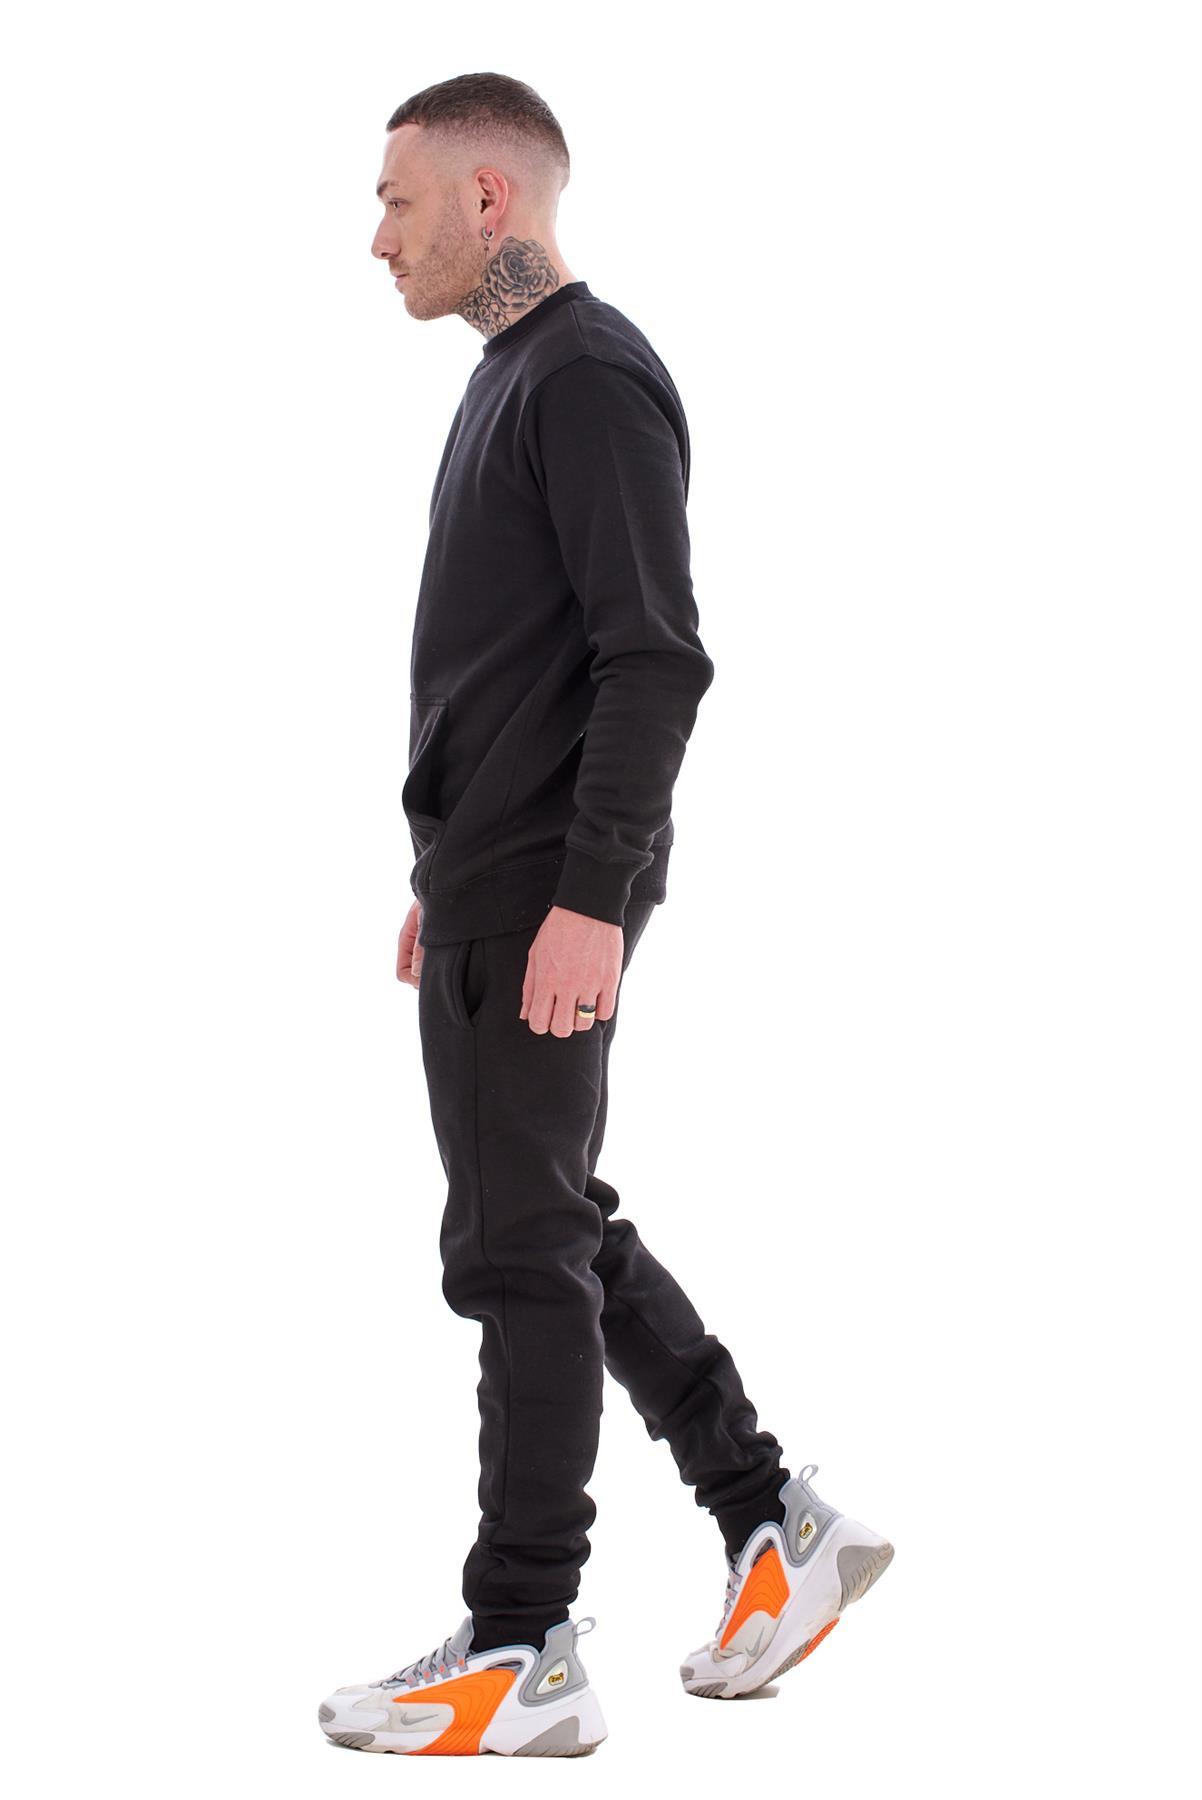 Mens-Plain-Tracksuit-Branded-Fleece-Pullover-Sweatshirts-Cotton-Jogging-Bottoms thumbnail 6